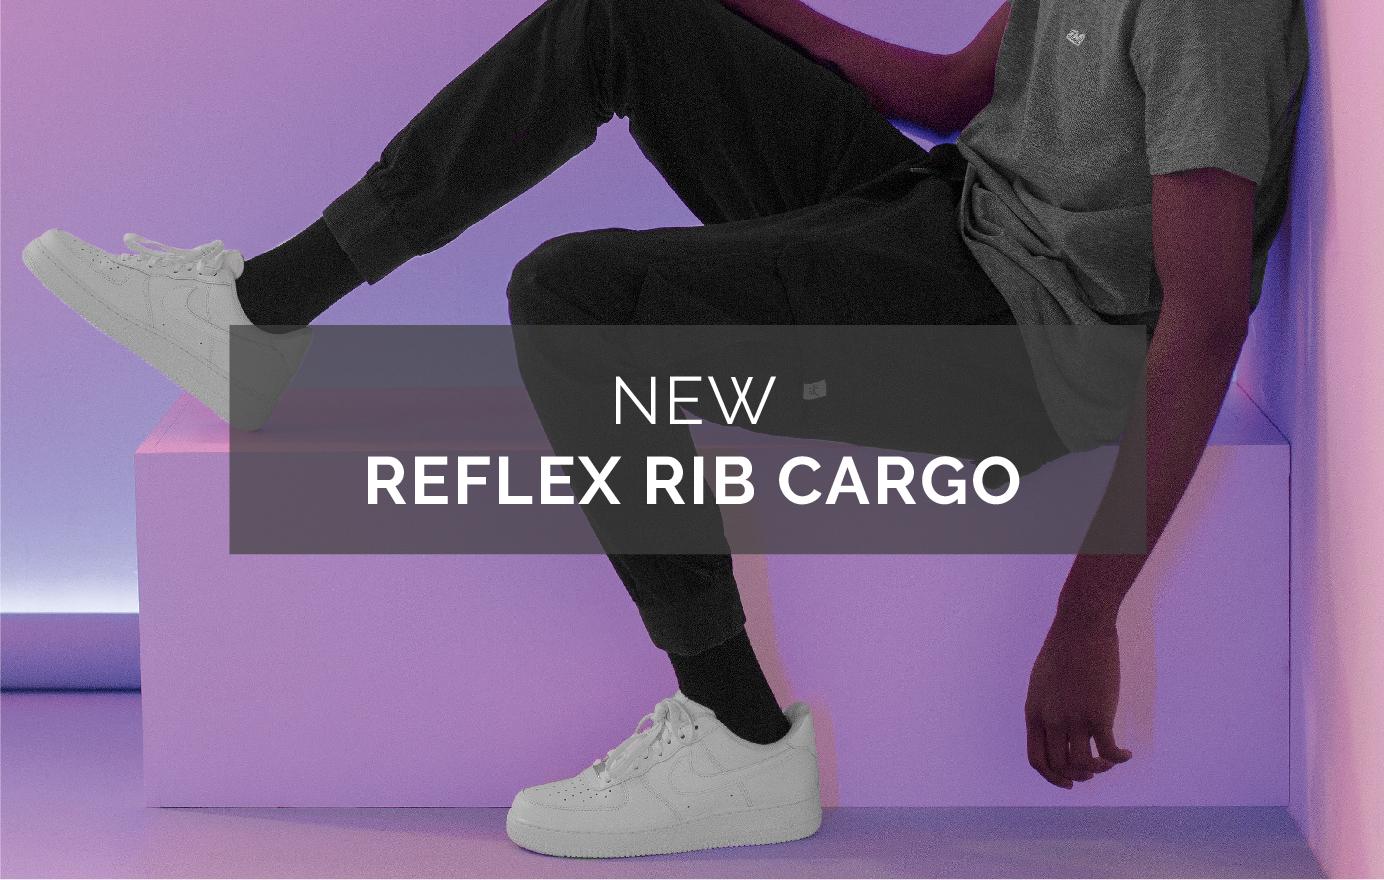 Reflex Rib Cargo